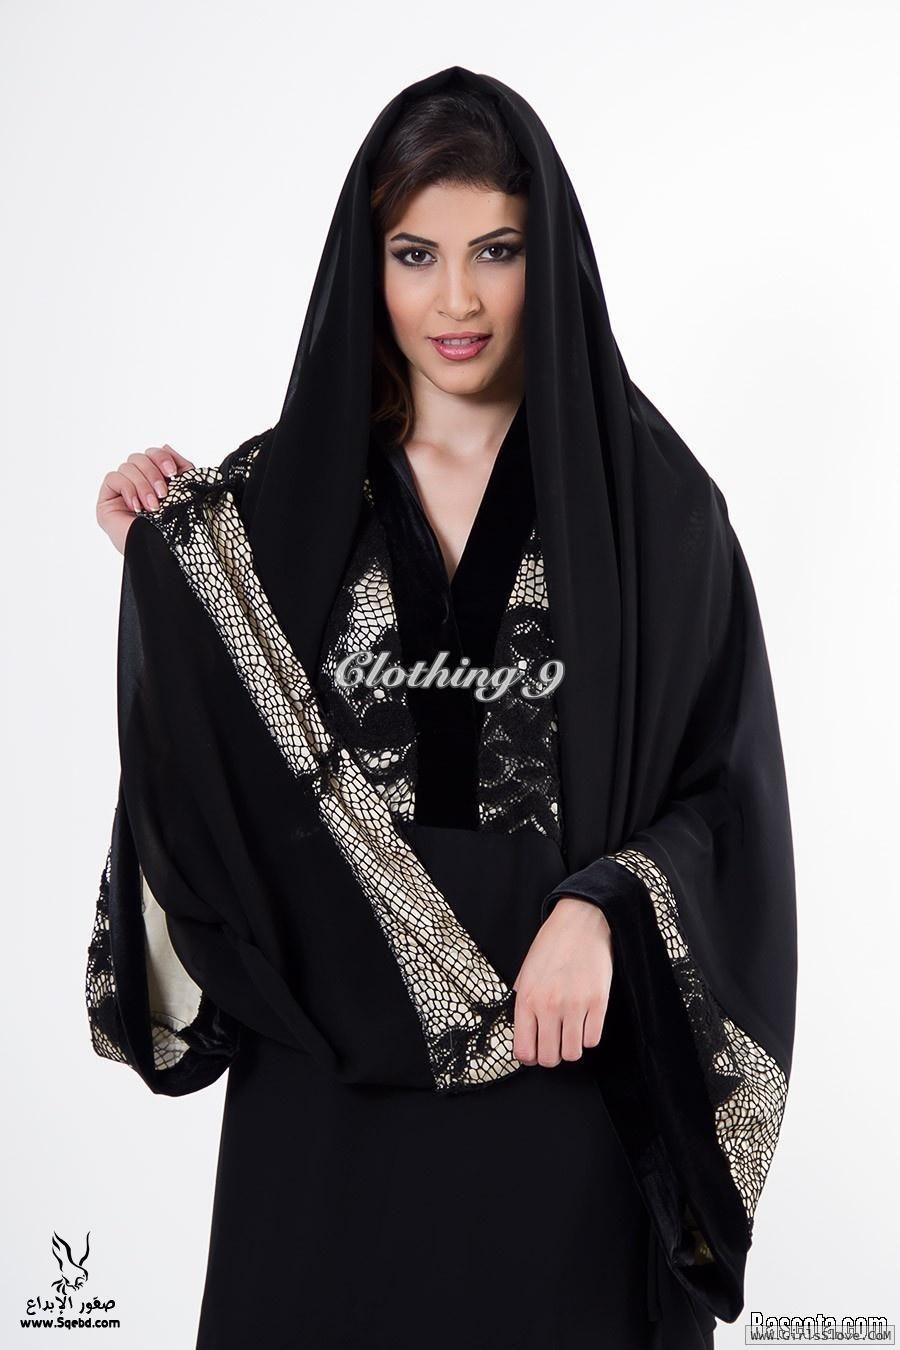 ������ ���� 2016 , ������ ���� ���� , ������ ���� ��� ����� ������ - ����� 2016 - Fashion veiled 2013_1372567765_822.